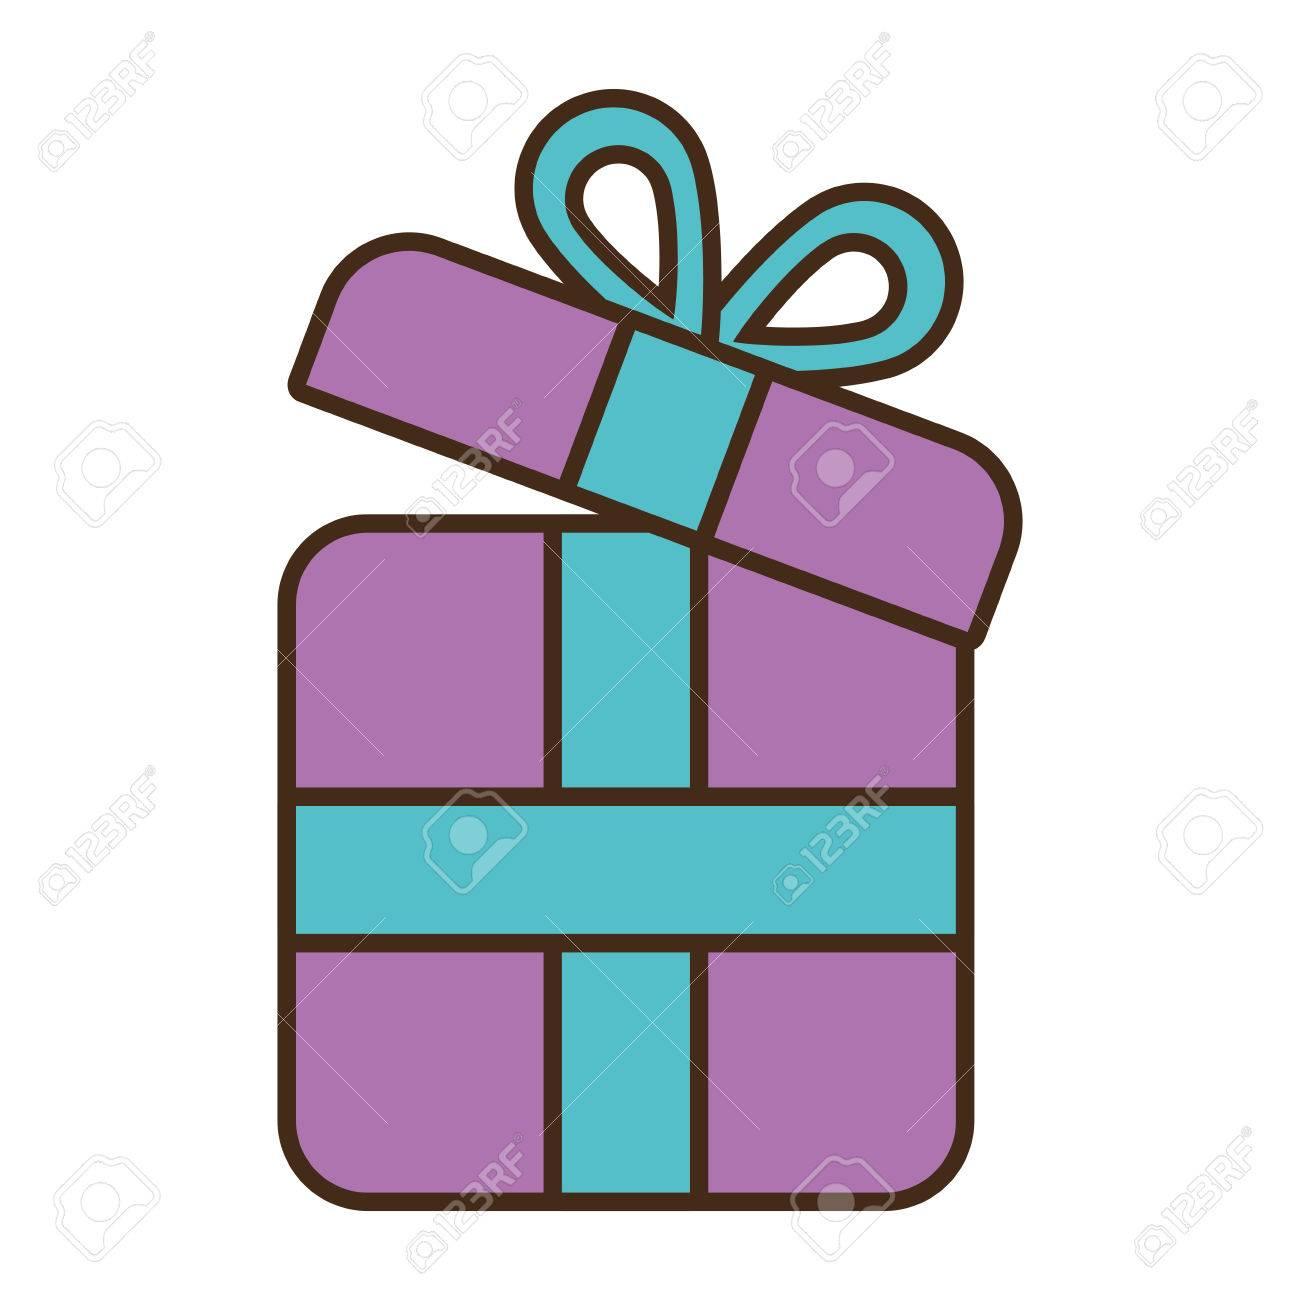 Caja De Regalo Púrpura Envoltura De Cinta De Ilustración Vectorial